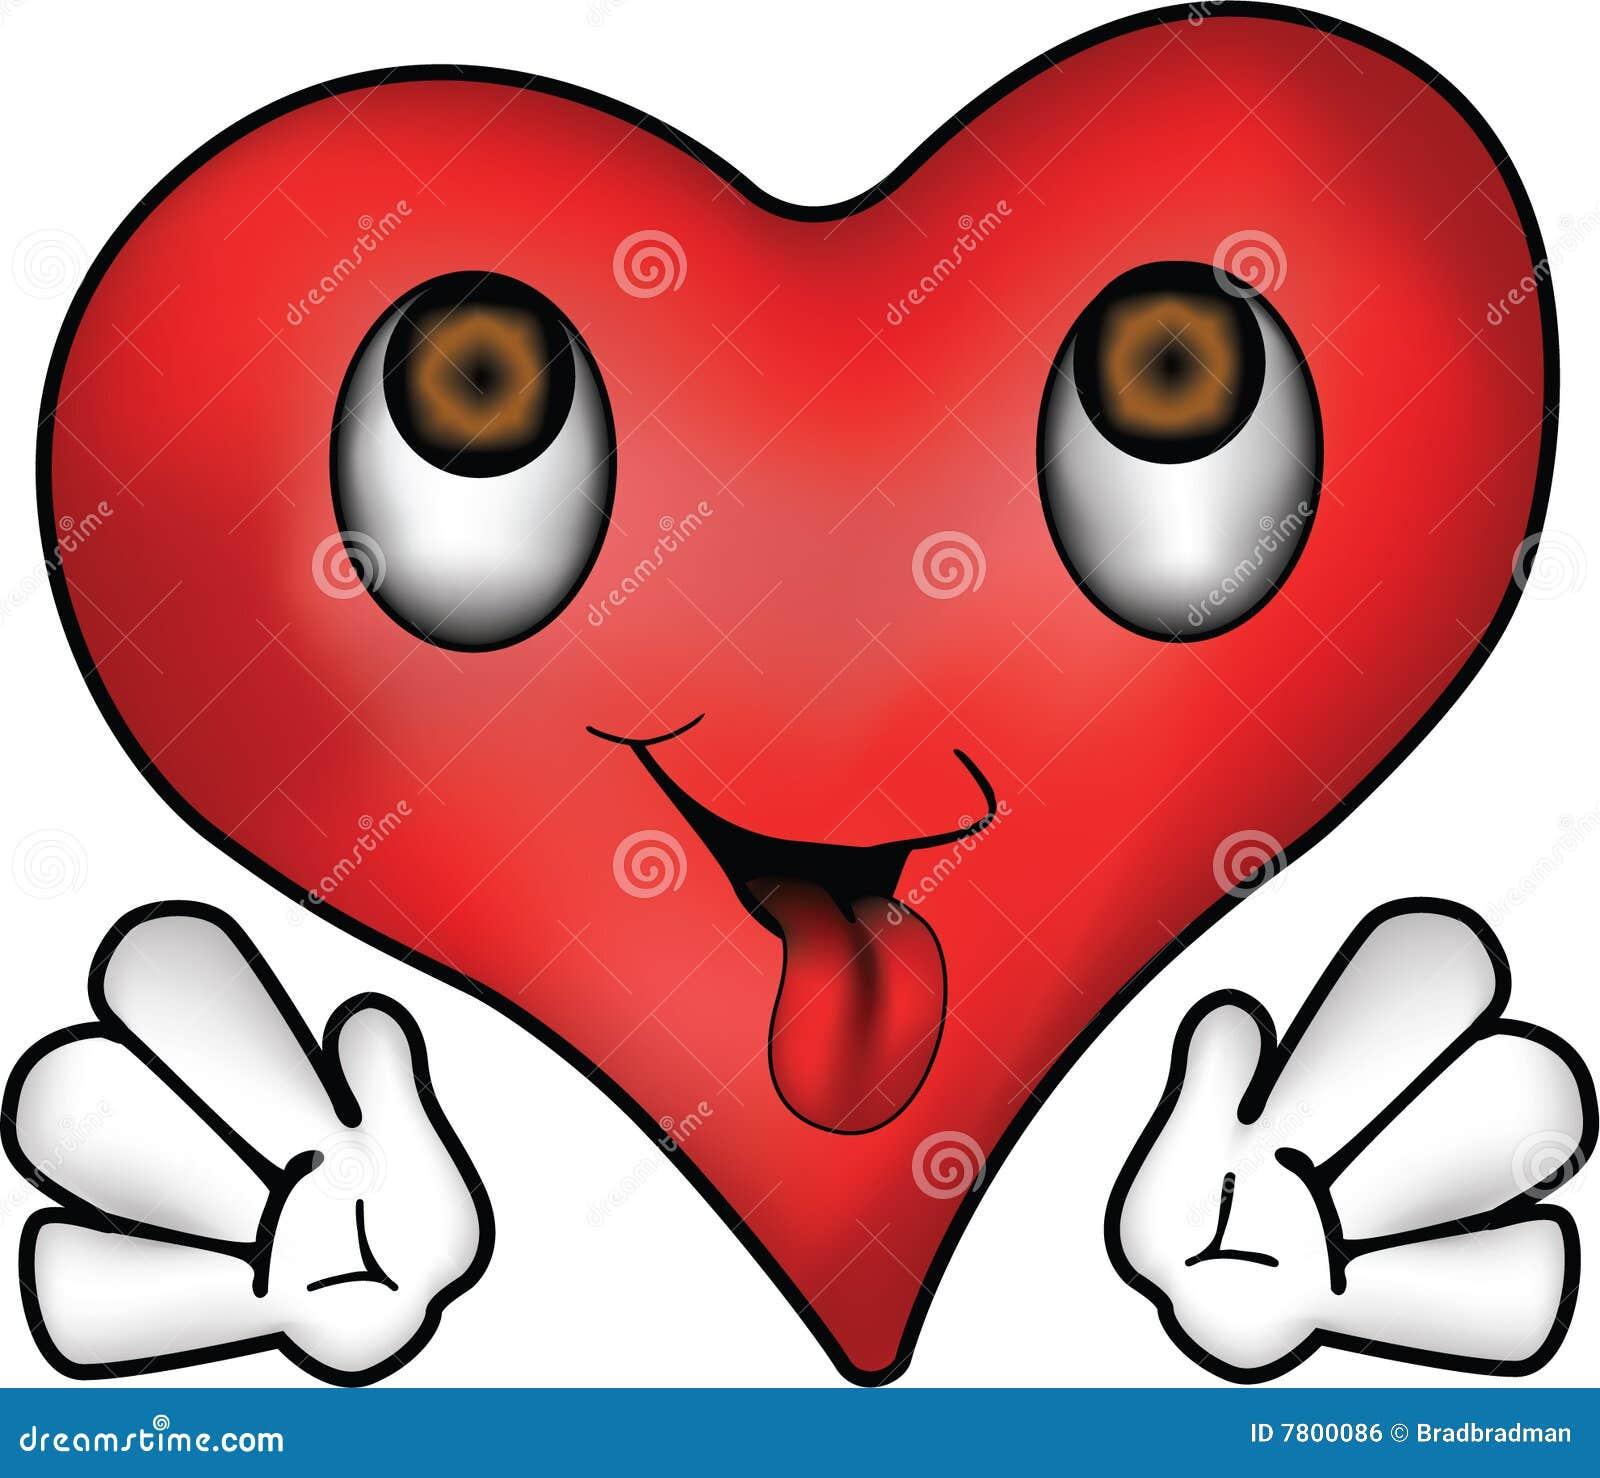 happy heart royalty free stock image image 7800086 ballet dancer clipart black and white ballet dancer clipart